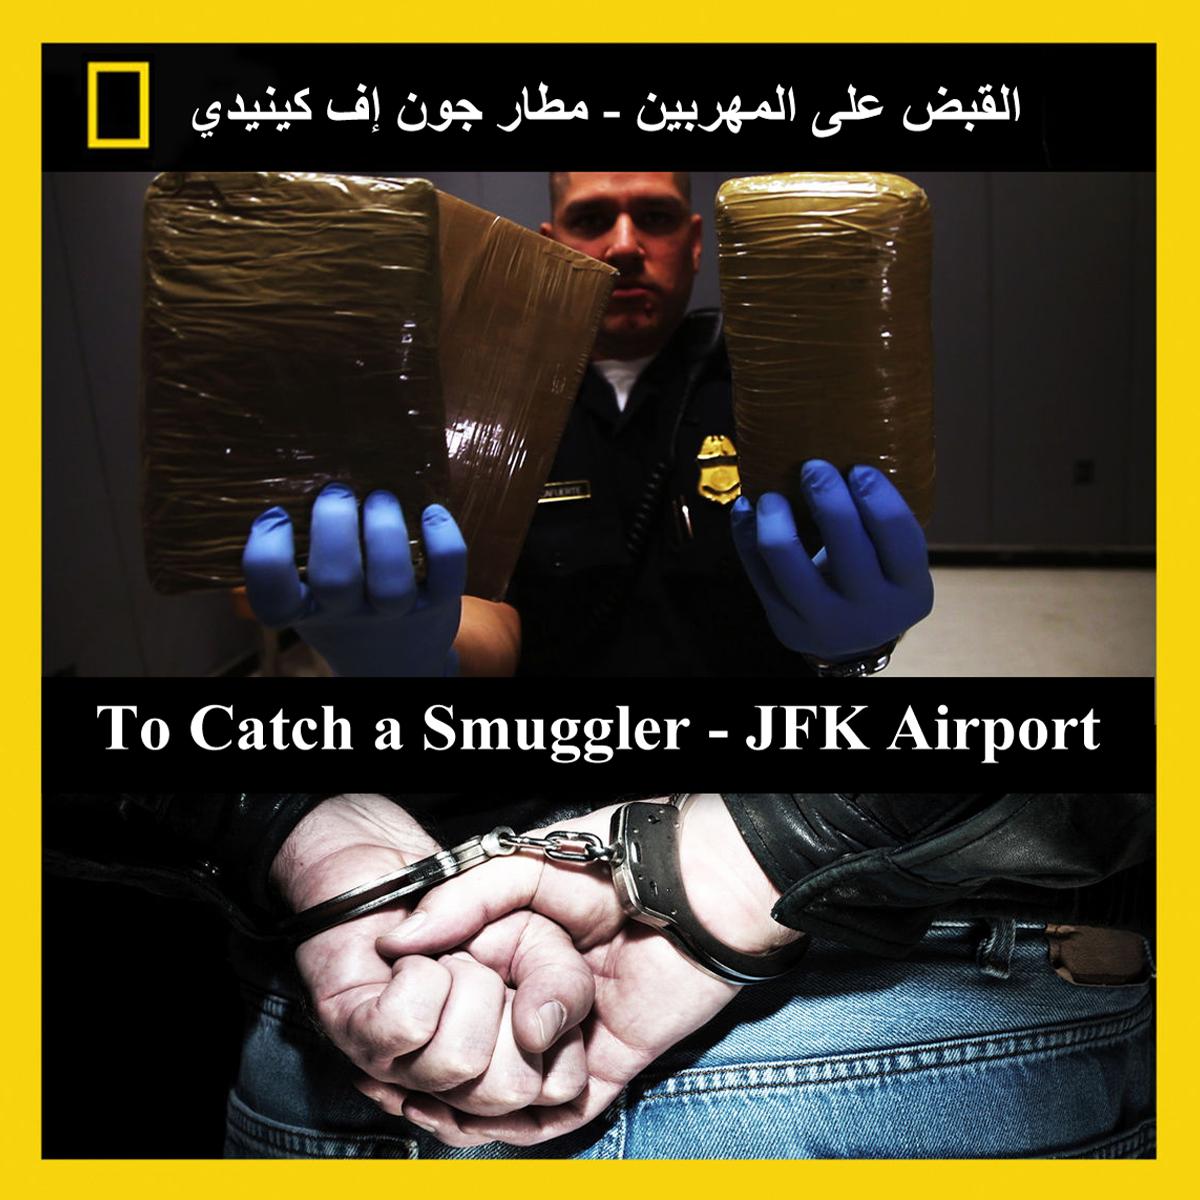 HDTV-1080p | سلسلة القبض على المهربين: مطار جون إف كينيدي -- Seeders: 1 -- Leechers: 0